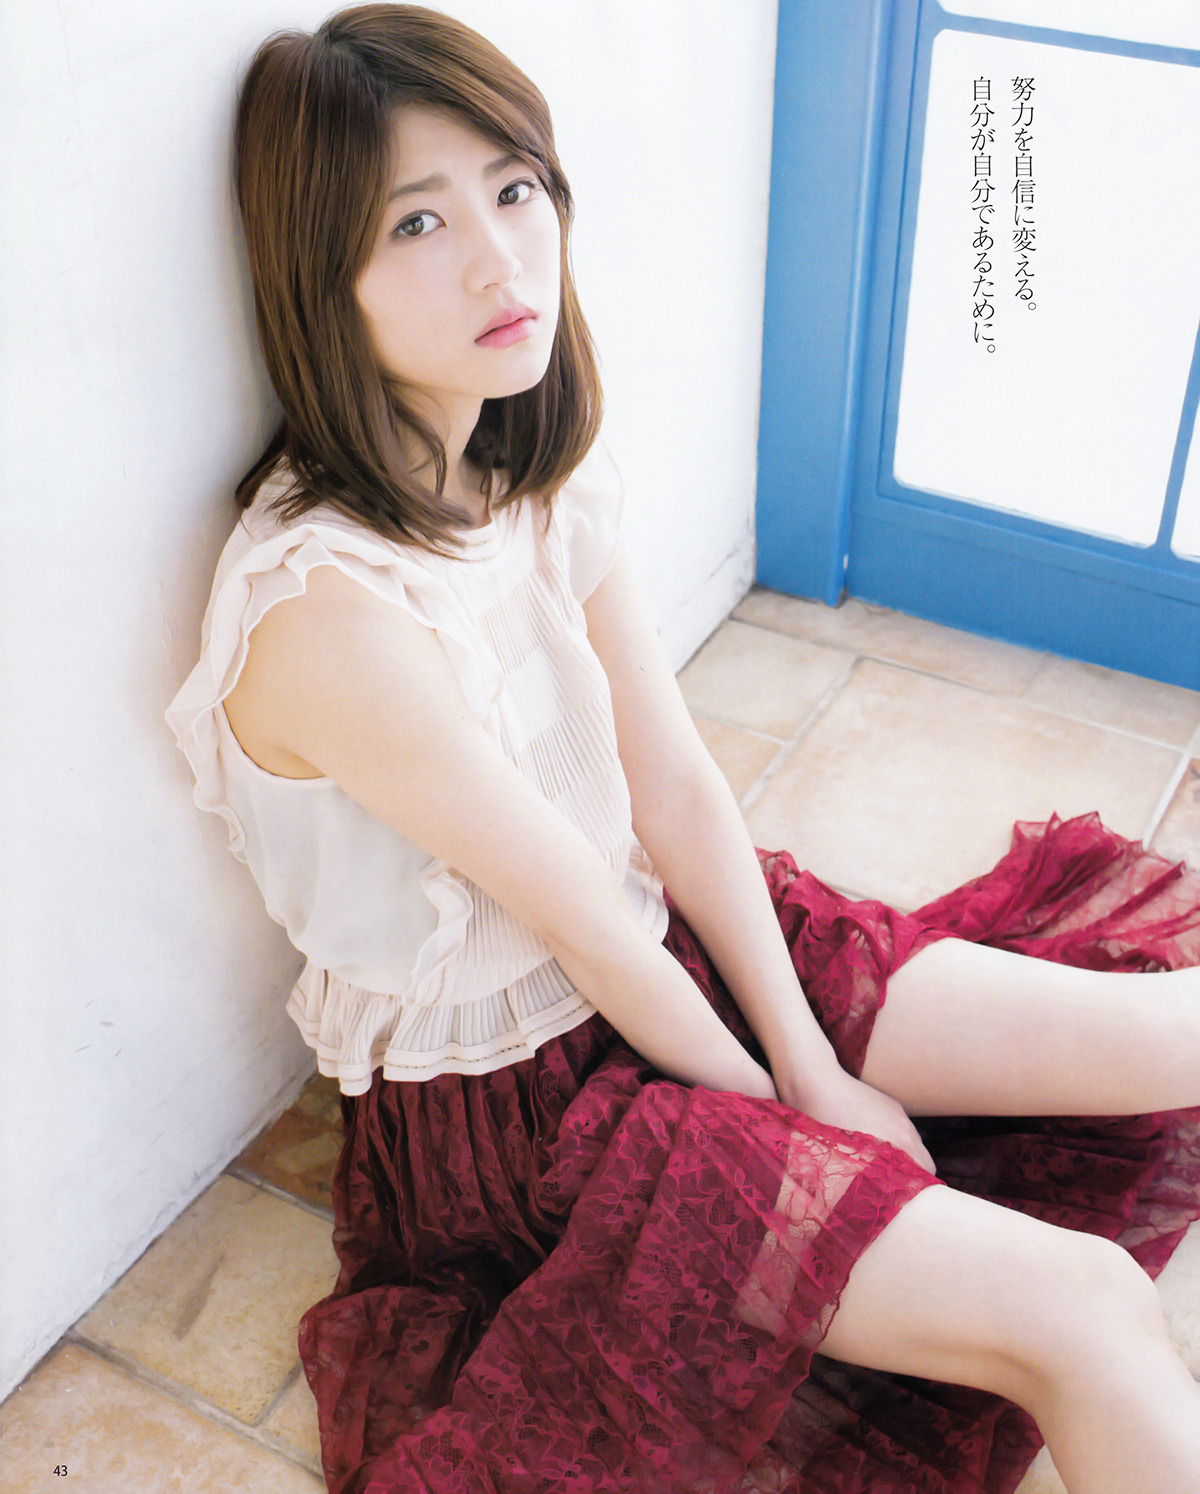 Wakatsuki Yumi 若月佑美, BOMB! 2017.11 (ボム 2017年11月号)